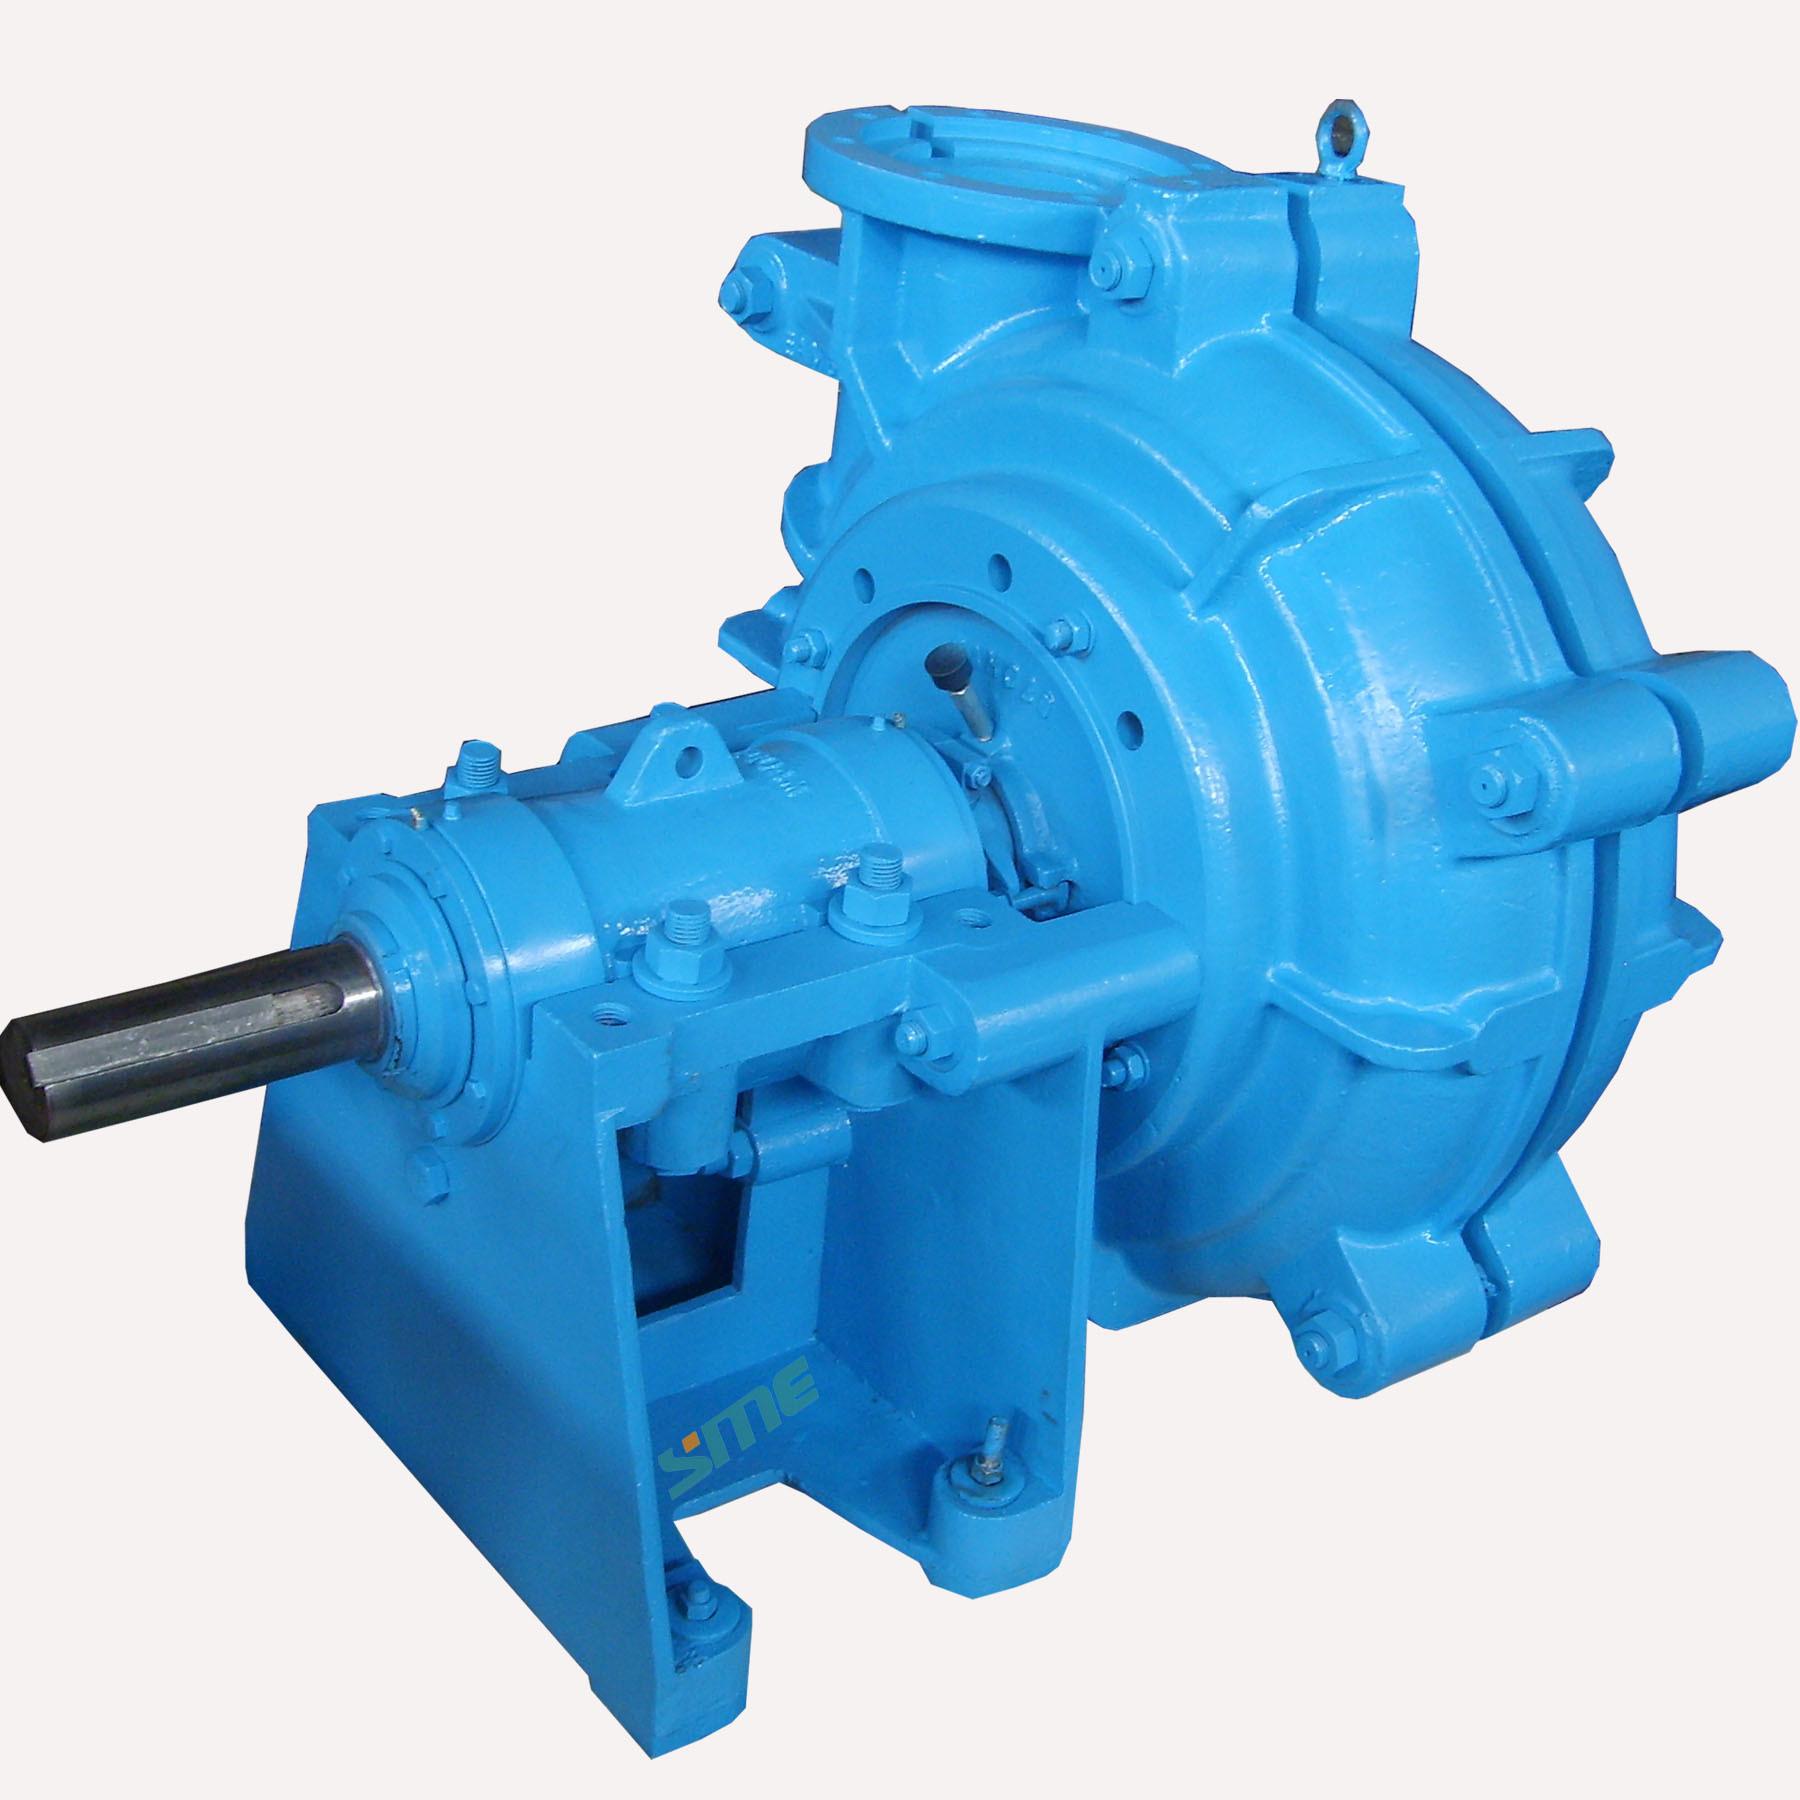 china booster slurry pump china centrifugal slurry pump create user guide online create user guide template